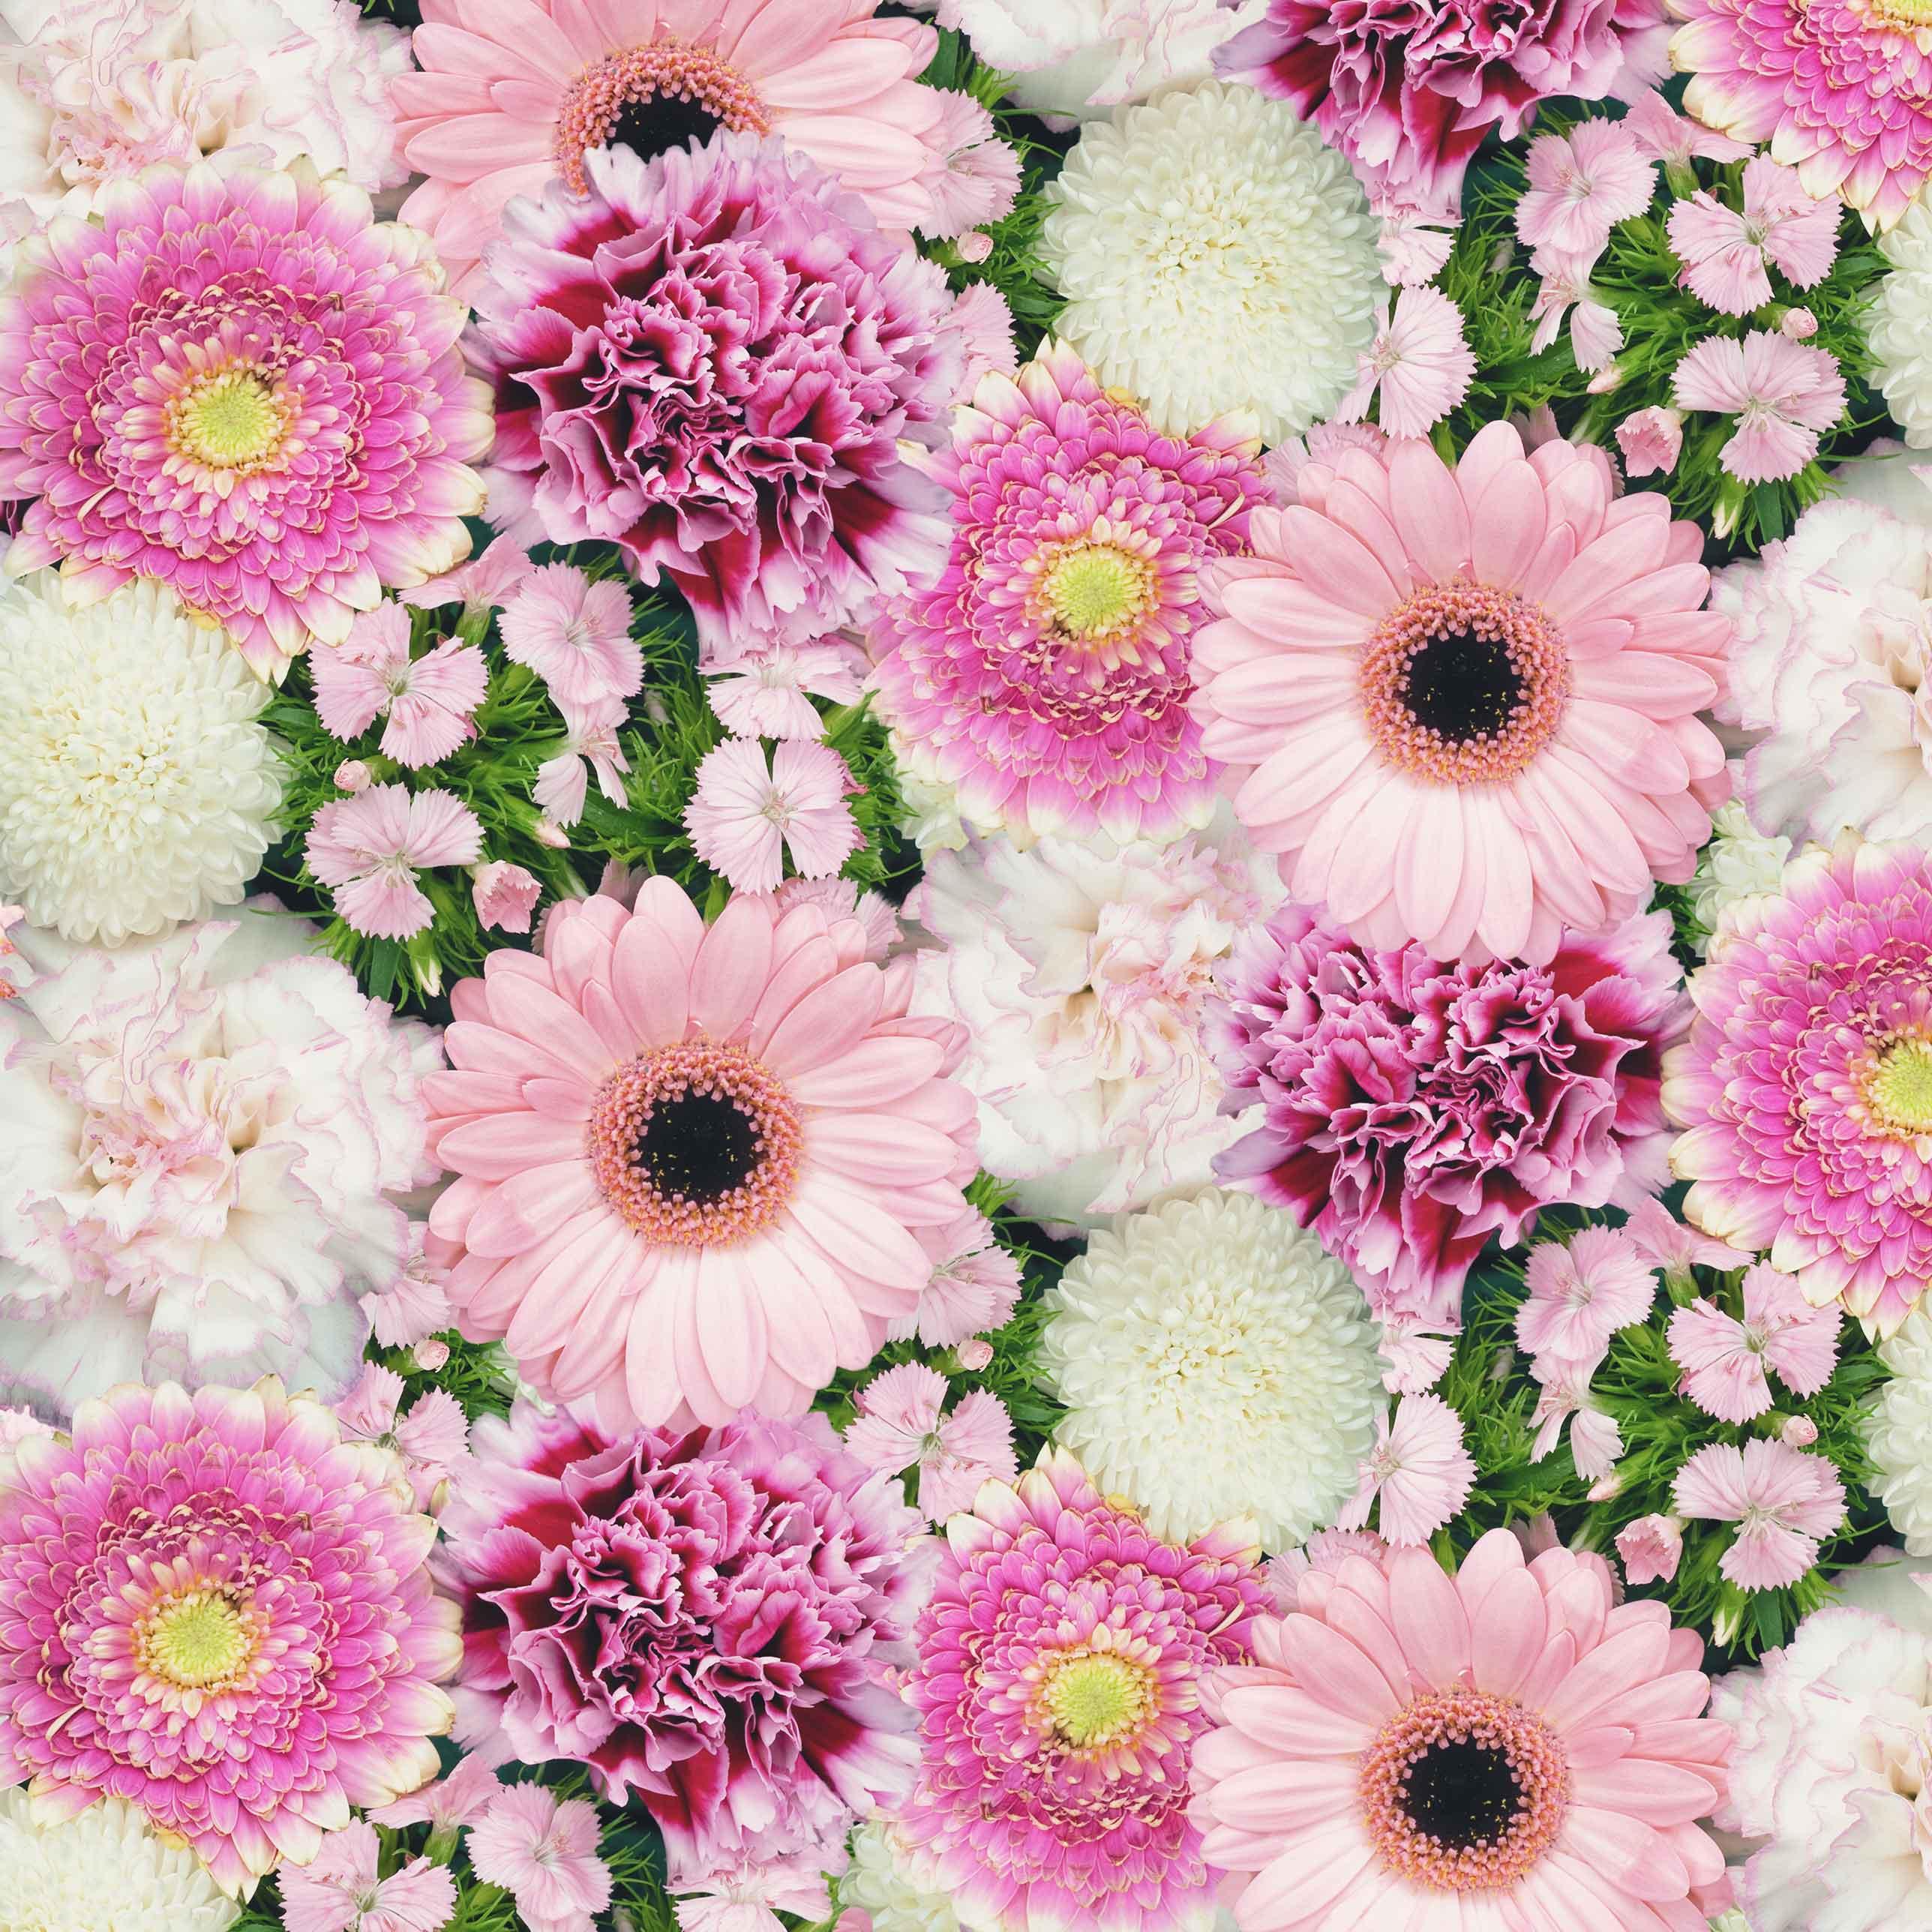 Plakfolie Flowers 6225 - 45cm x 2m